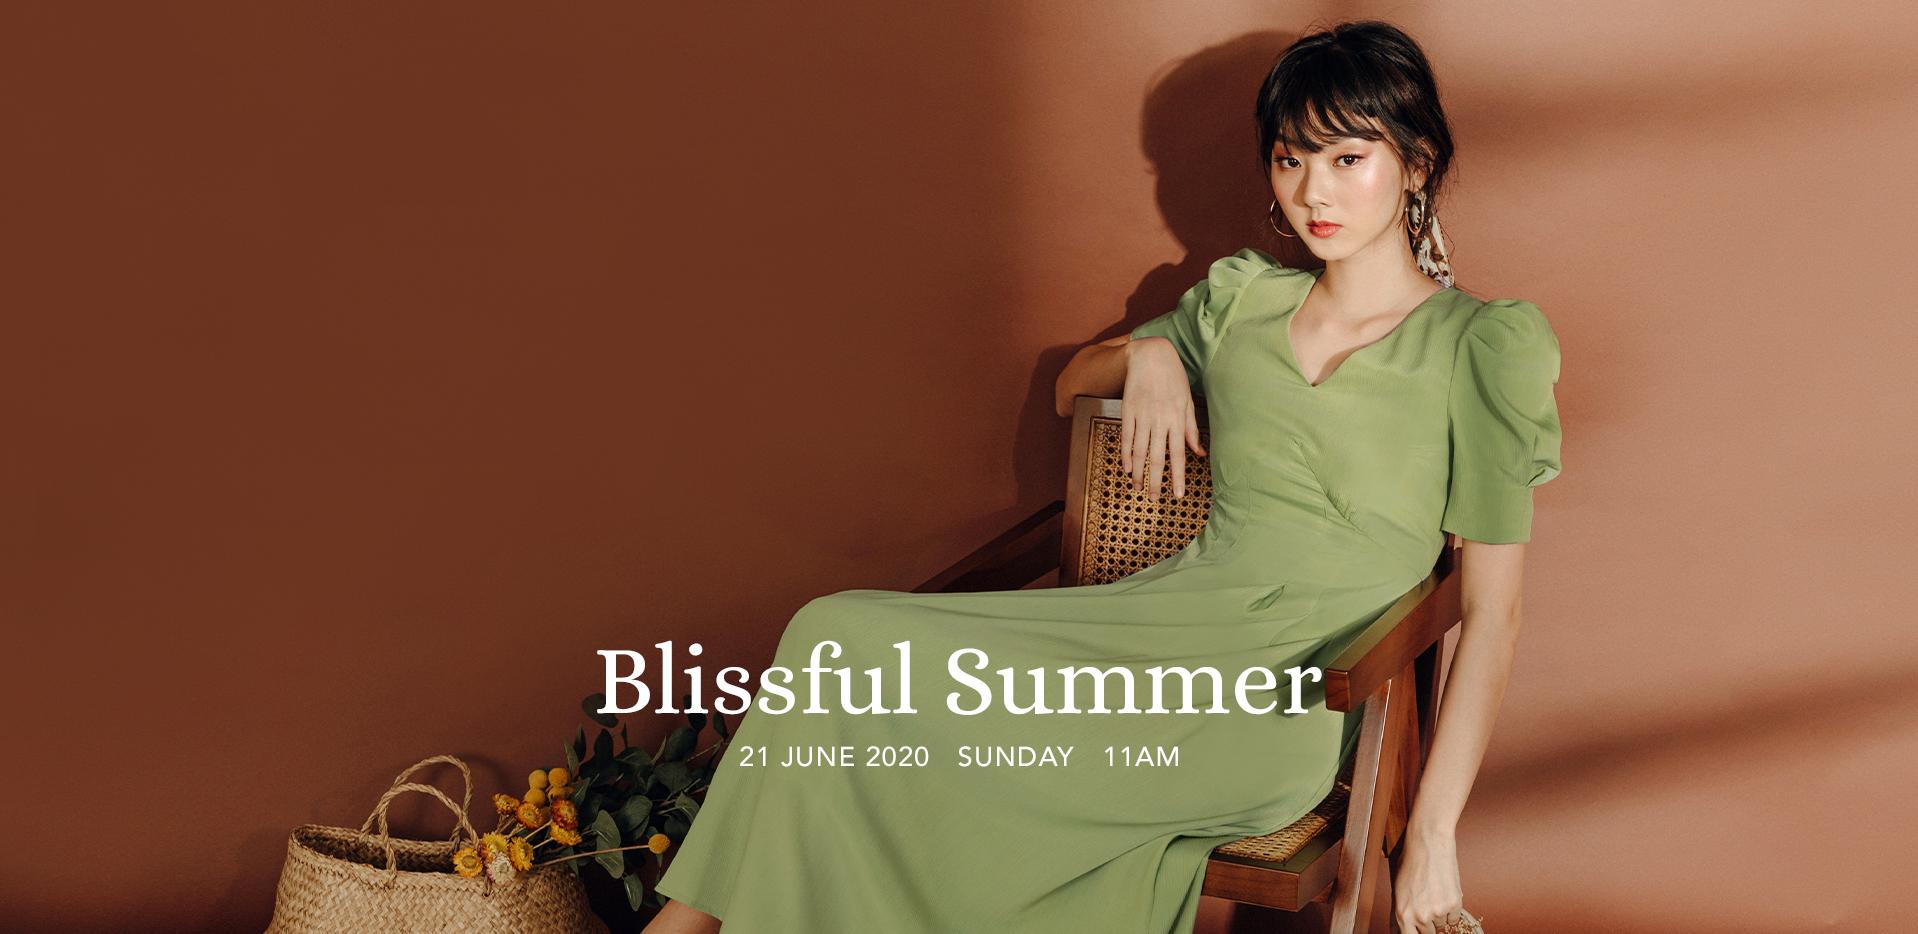 BLISSFUL SUMMER